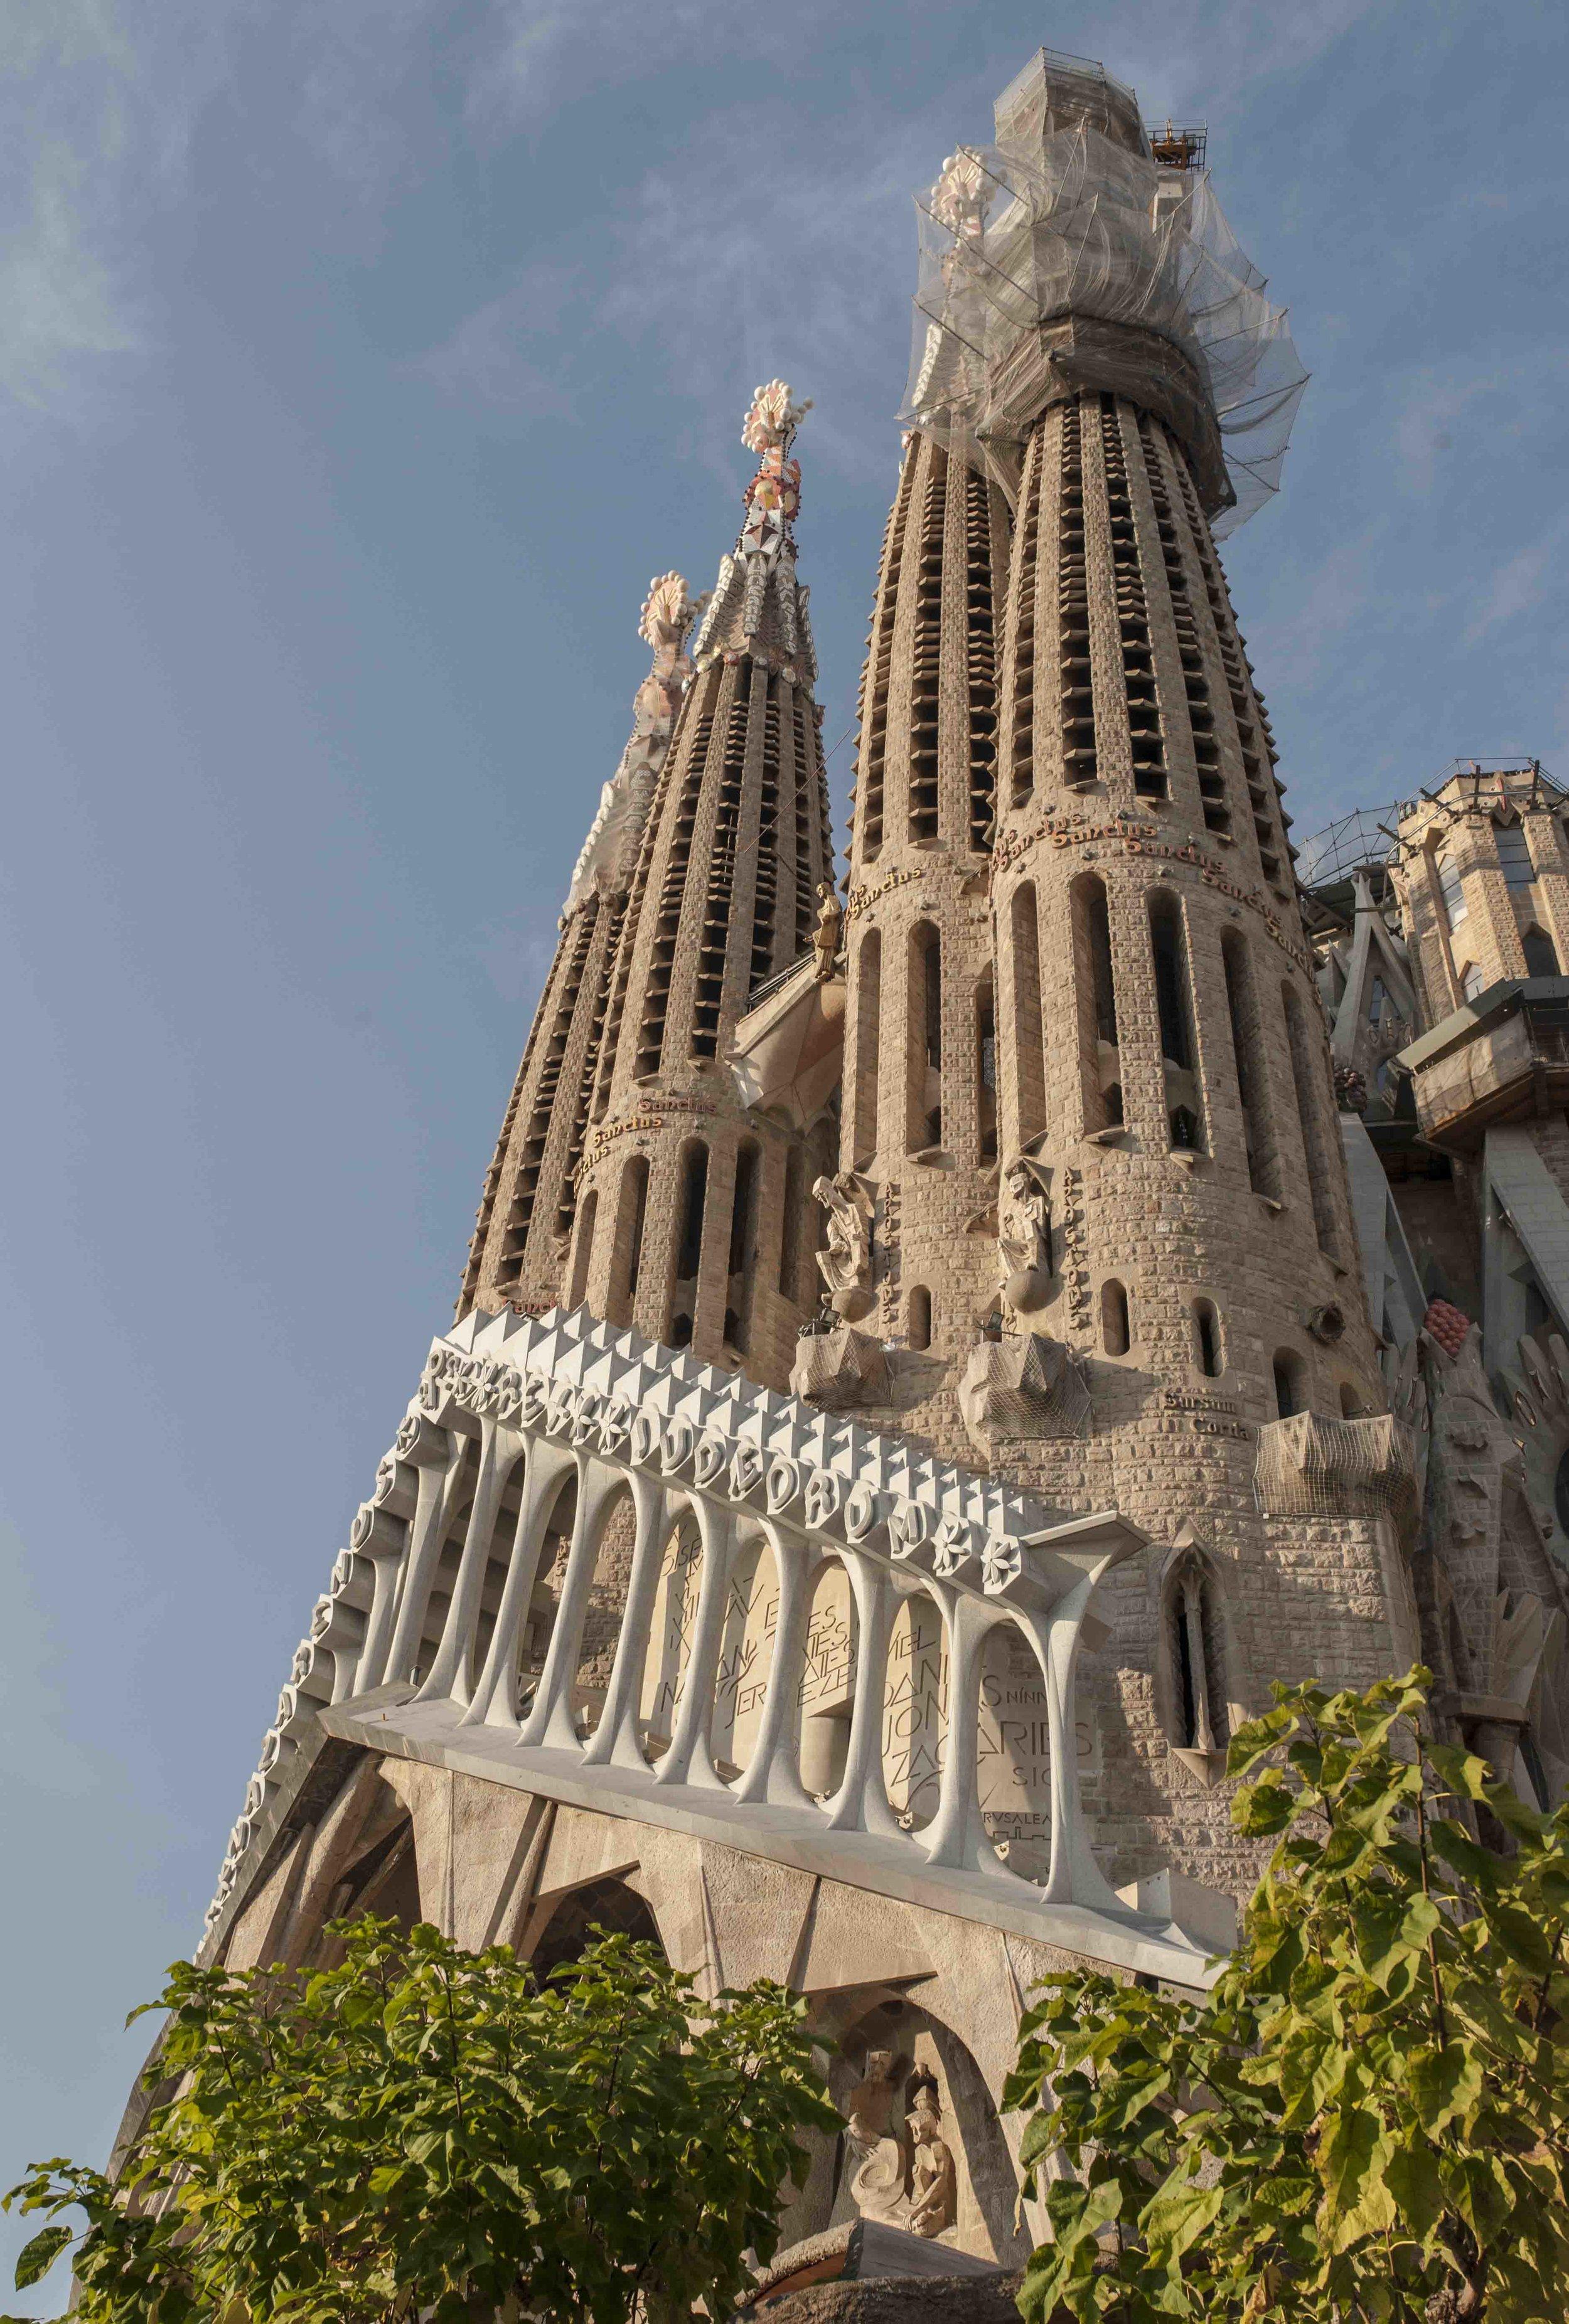 Obligatory Sagrada Familia photo